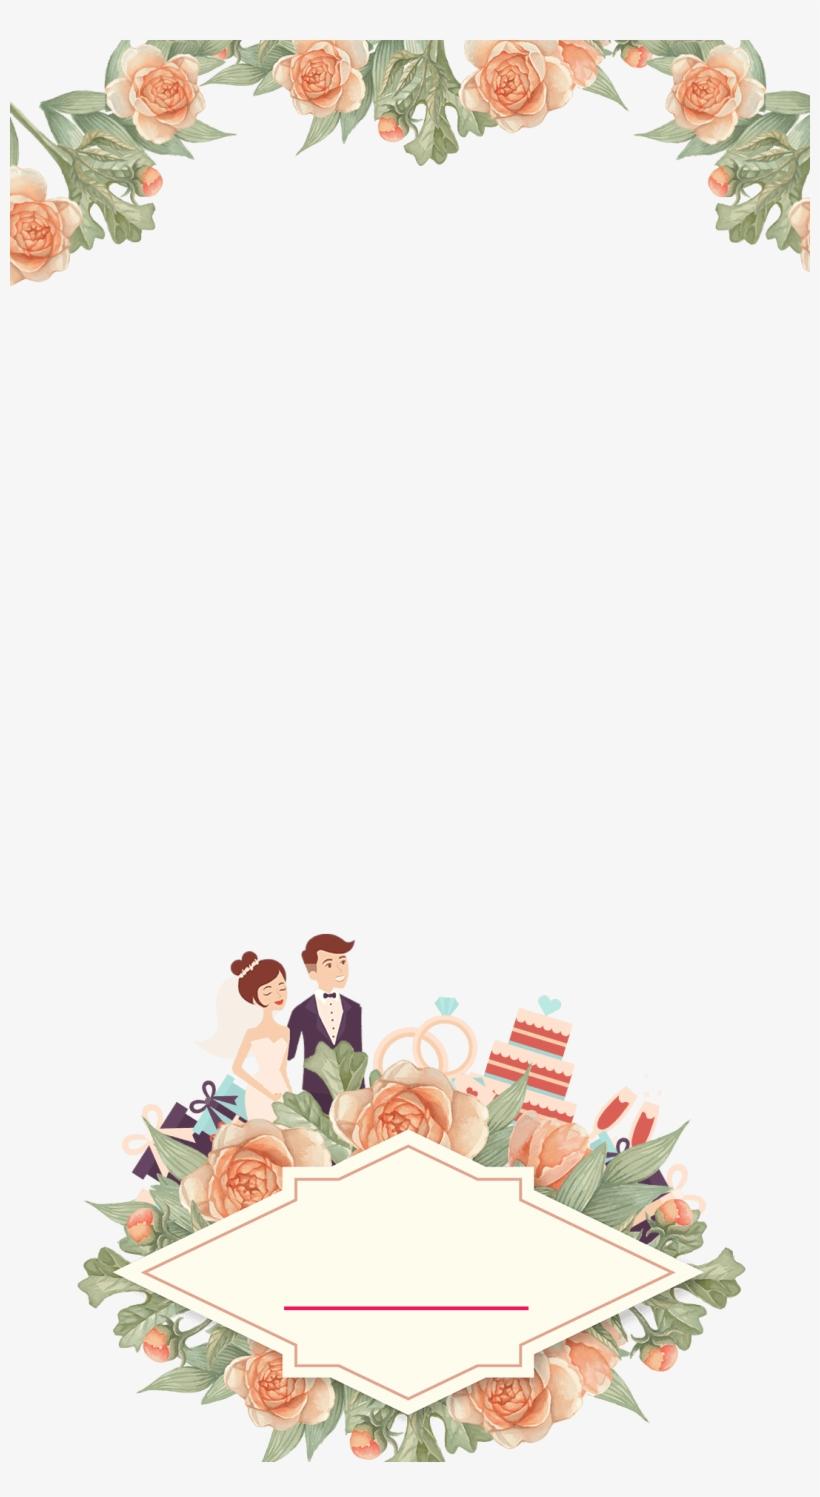 Pastel Floral Wedding Snapchat Filter - Wedding Snapchat